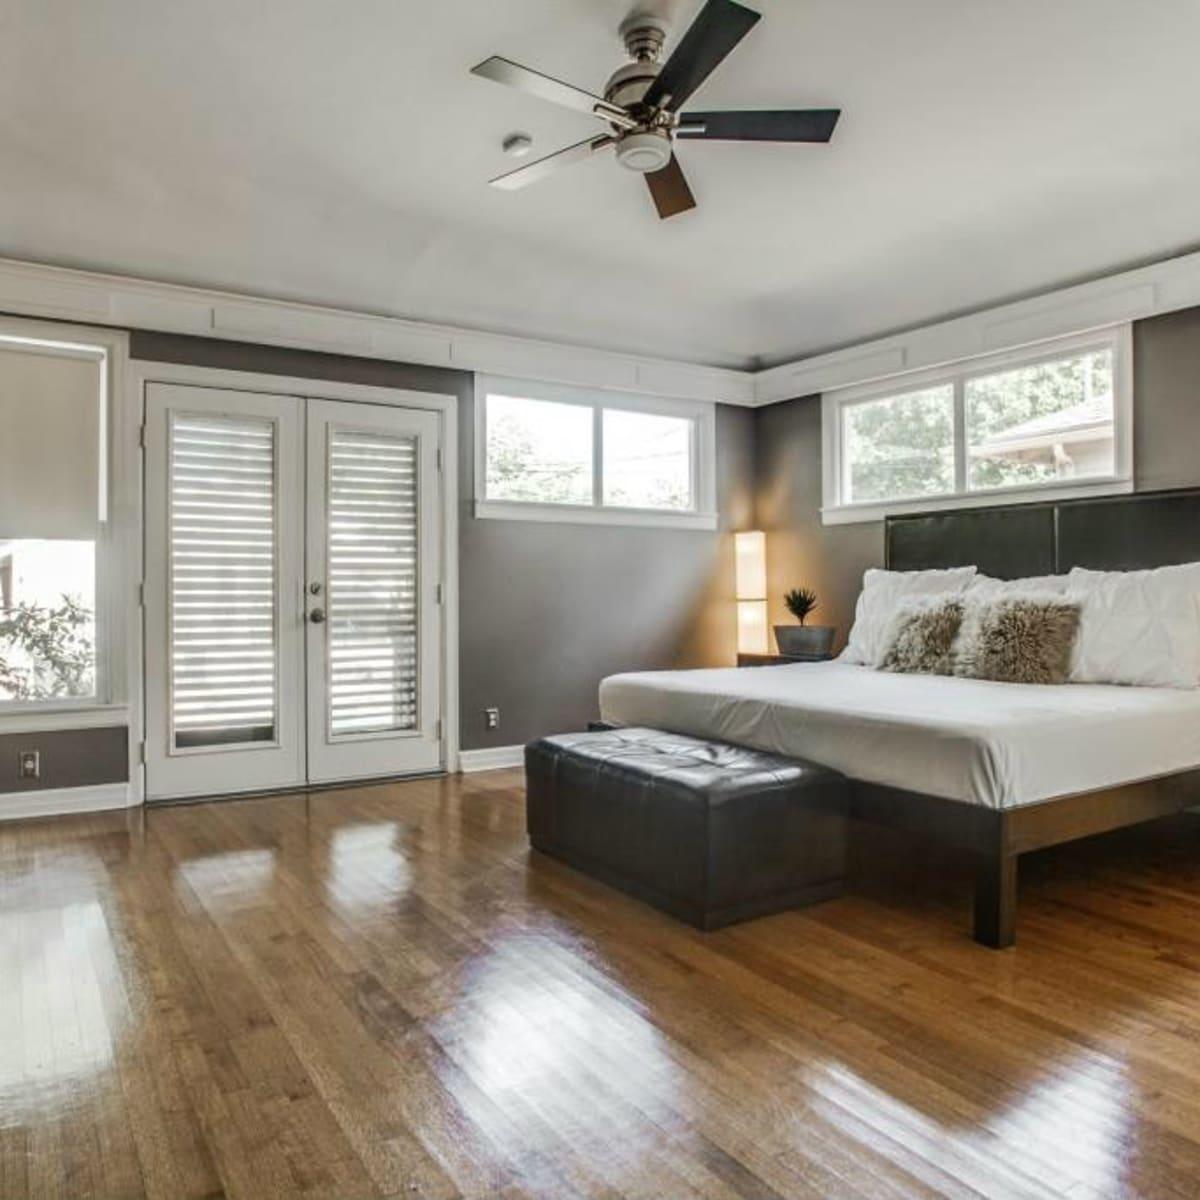 Master bedroom at 114. N Edgefield in Dallas